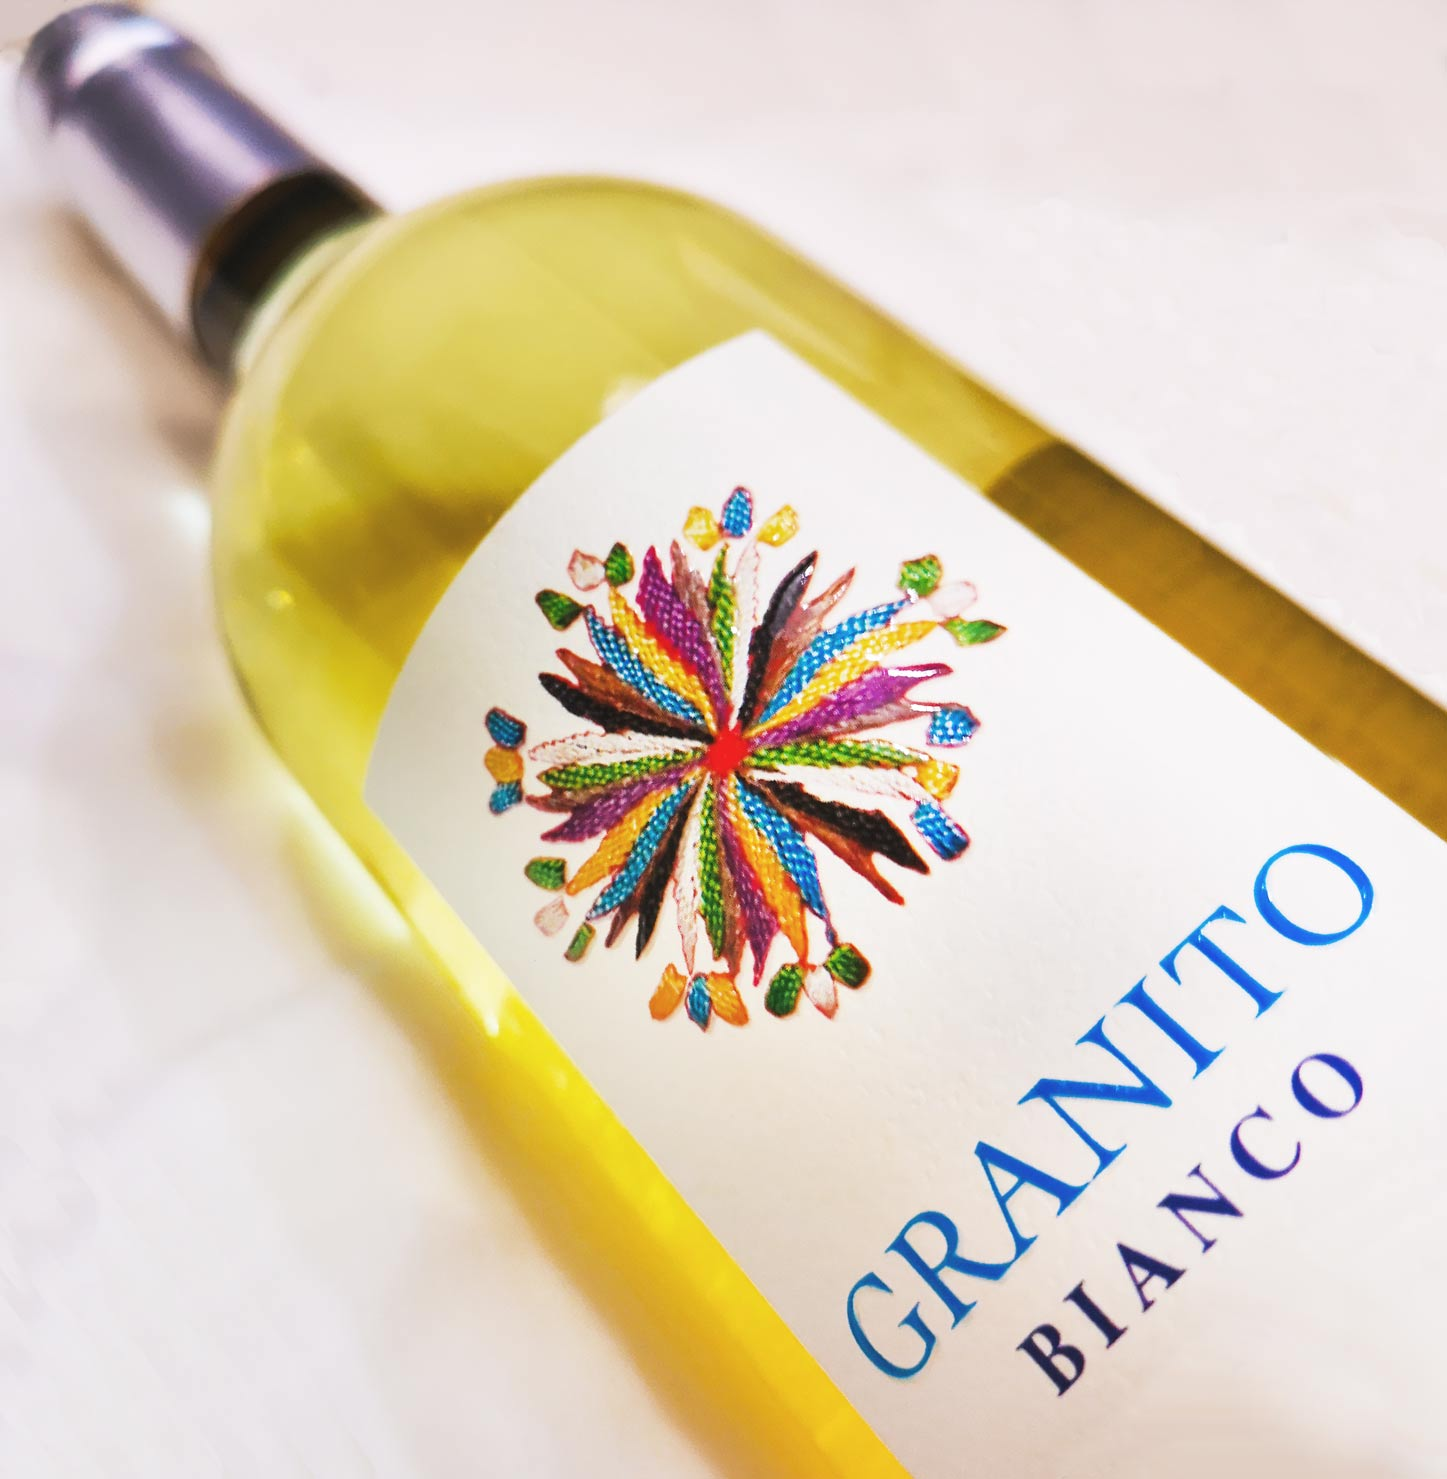 Mandrolisai Granito Bianco - Vino bianco di Sardegna - Isola dei Nuraghi